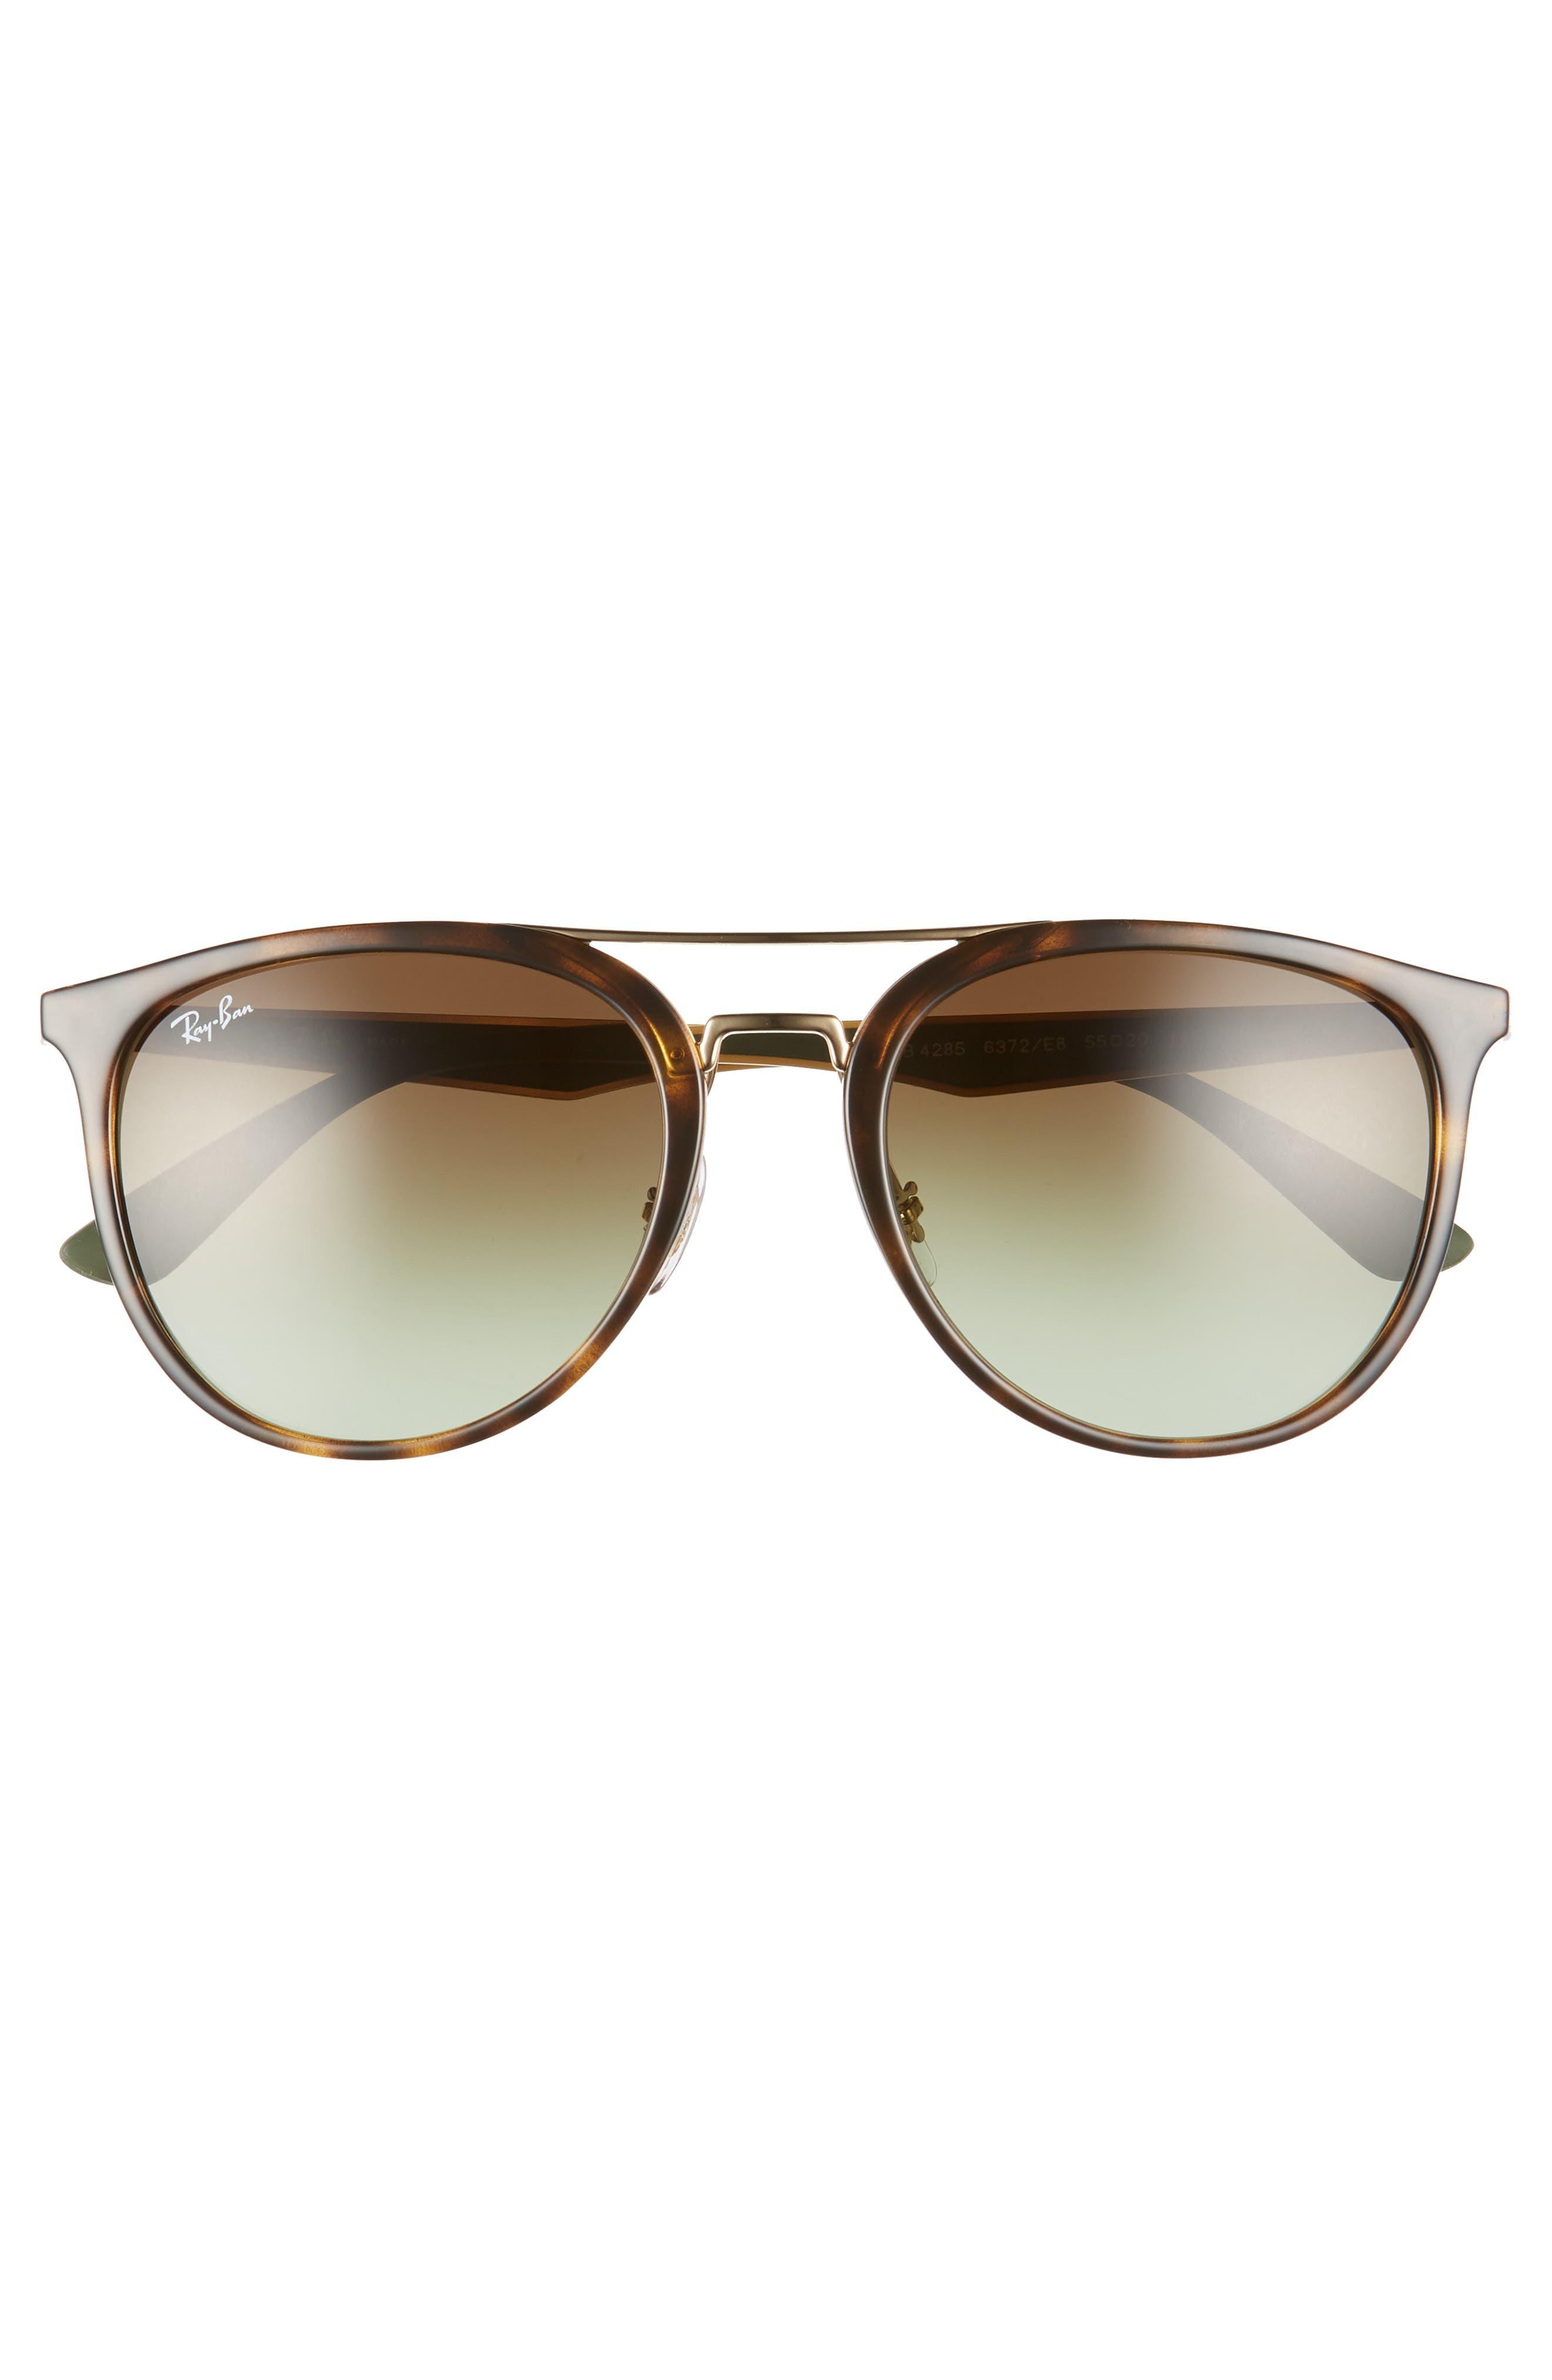 55mm Retro Sunglasses,                             Alternate thumbnail 3, color,                             HAVANA